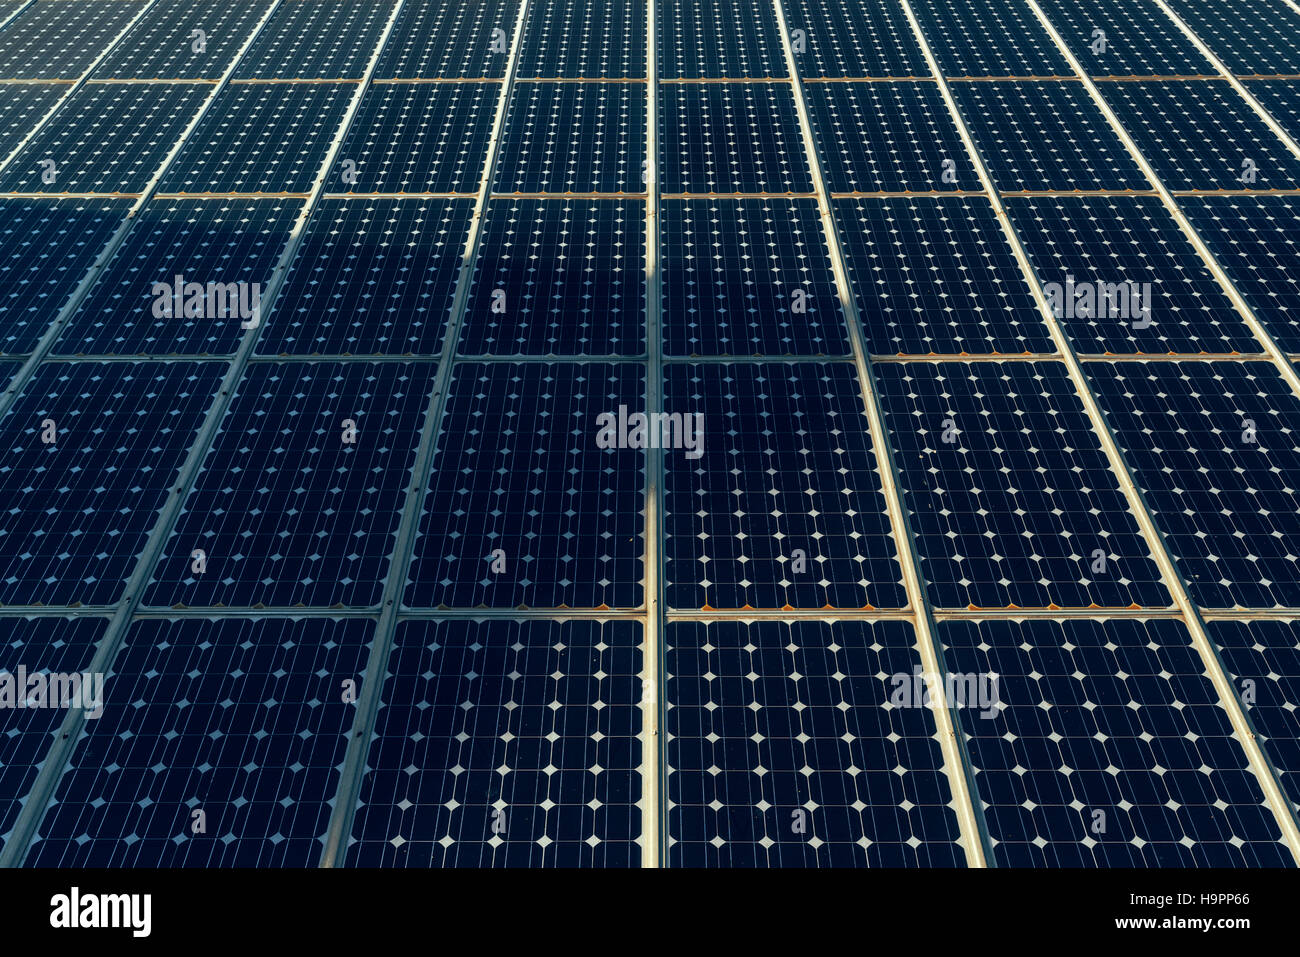 Superficie de paneles solares Imagen De Stock